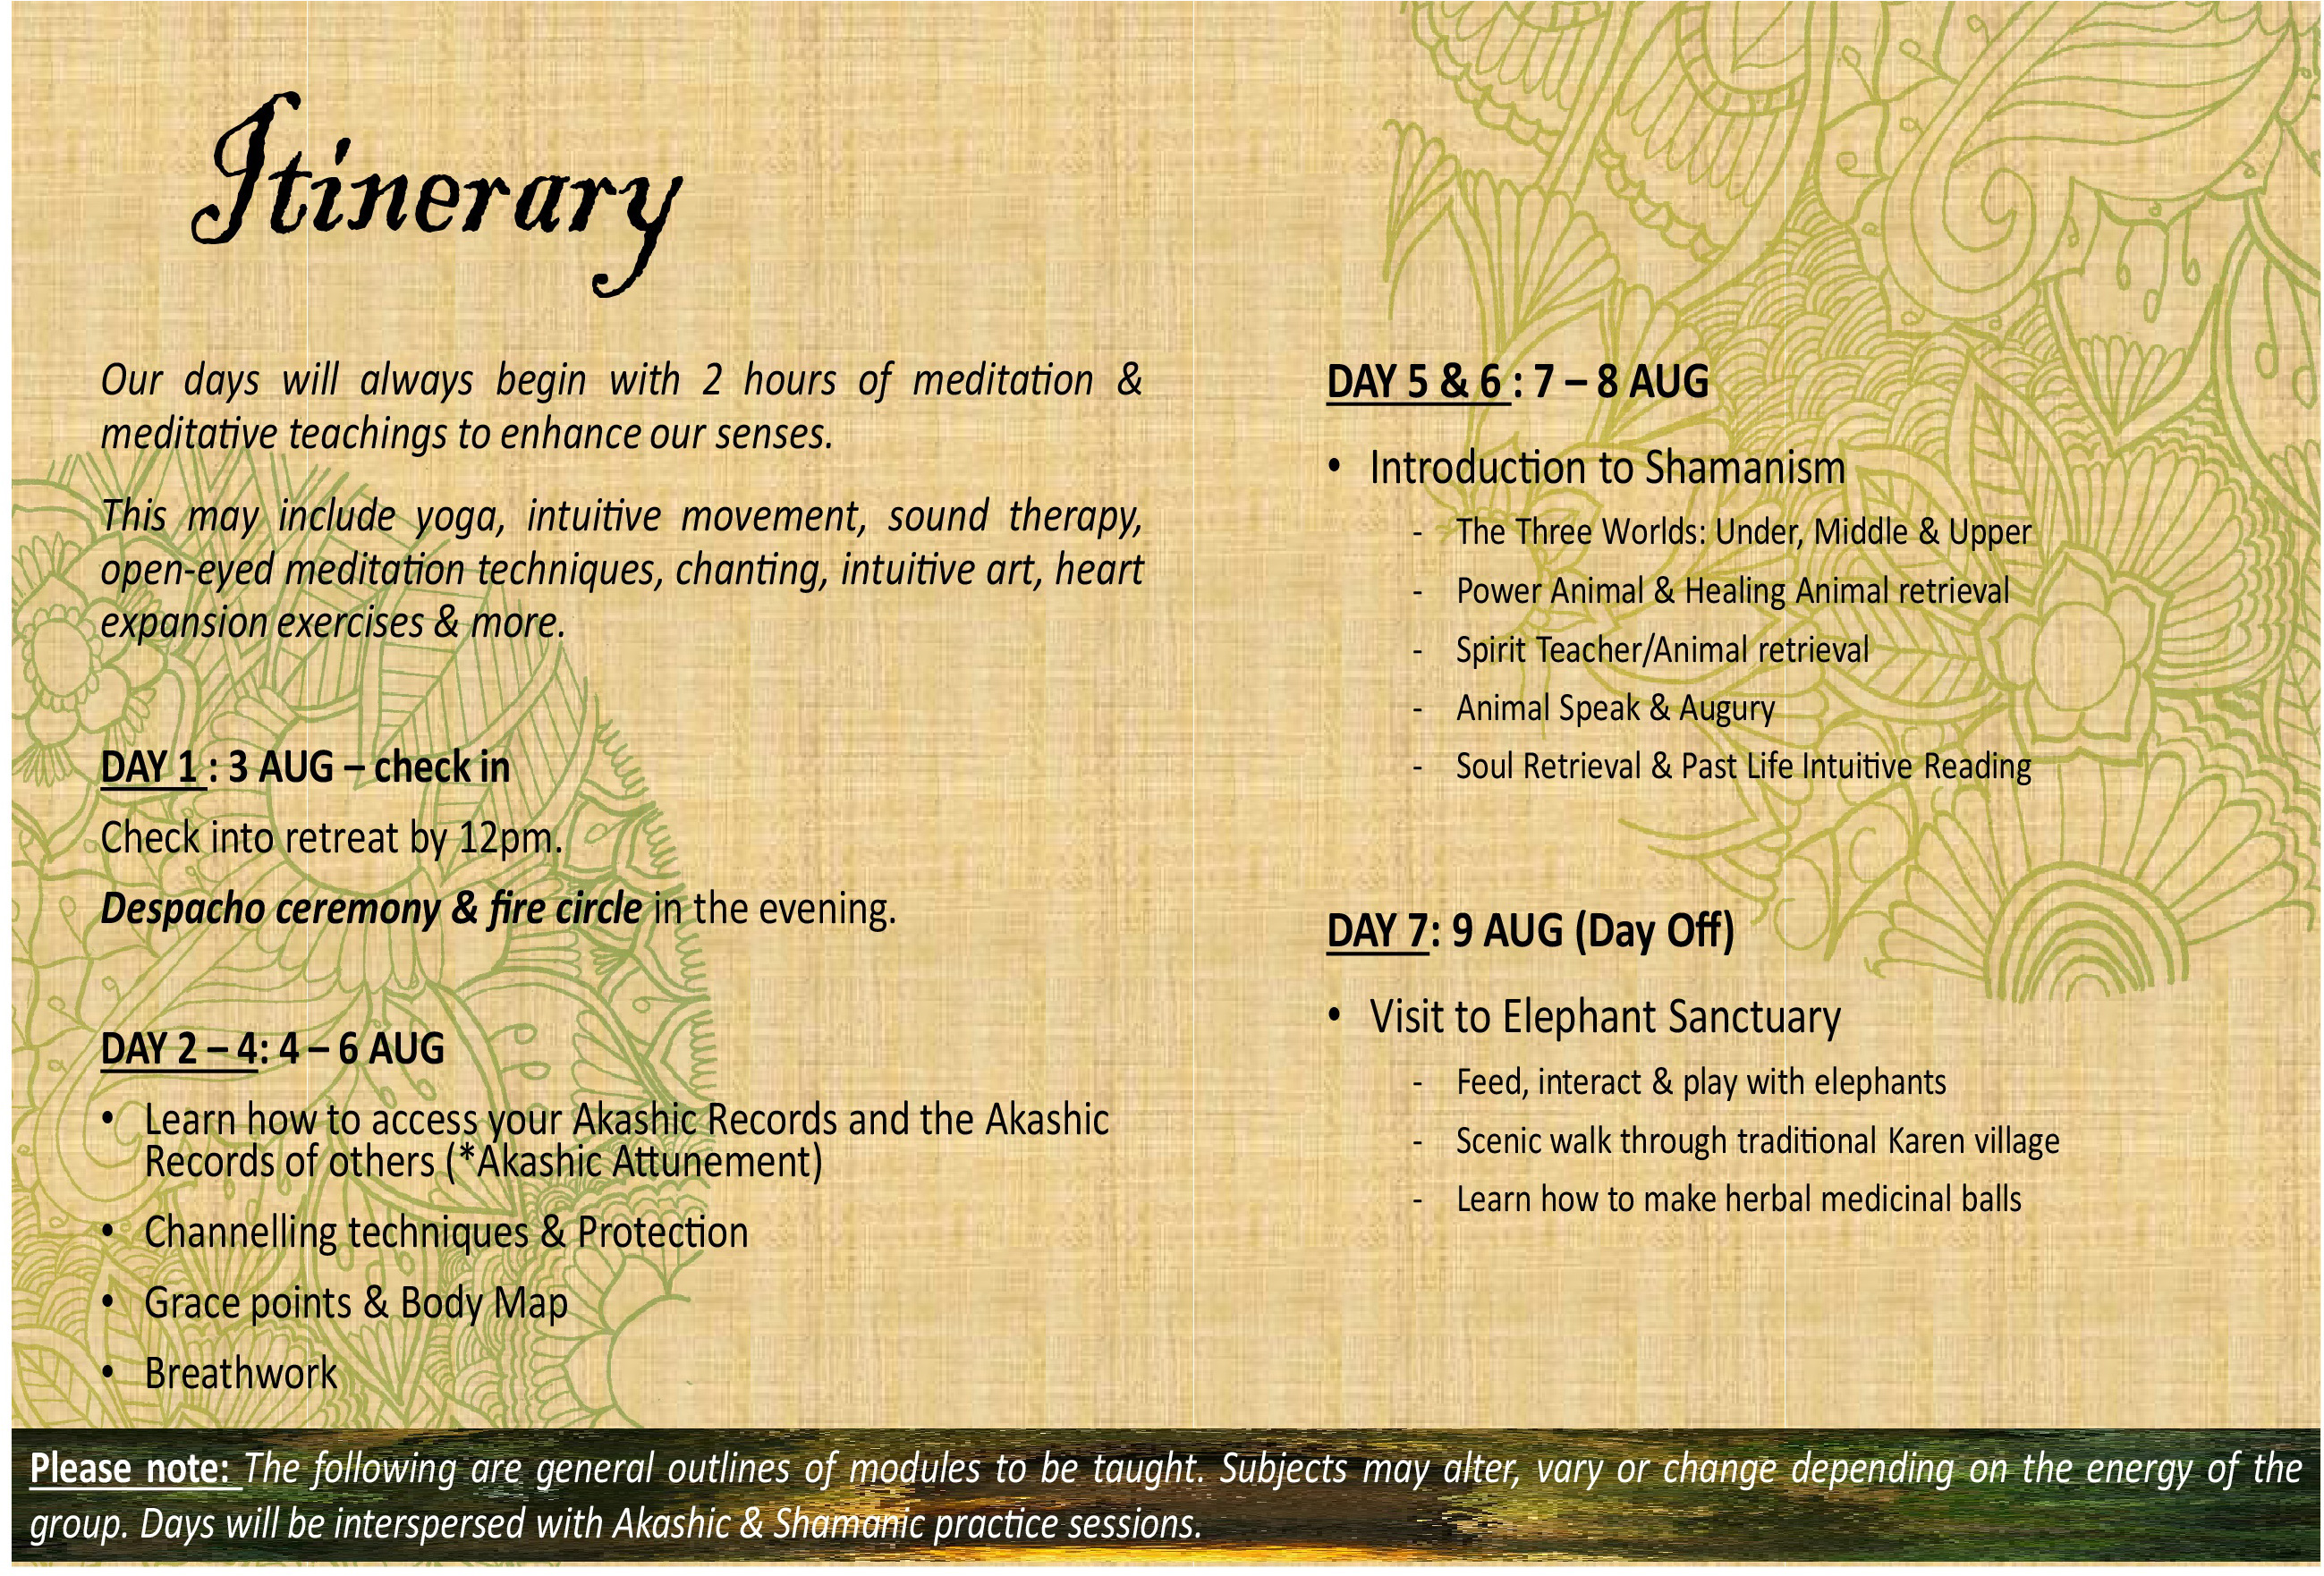 Itinerary of Akashic records Retreat at Mala Dhara Yoga Retreat Center in Chiang Mai Thailand